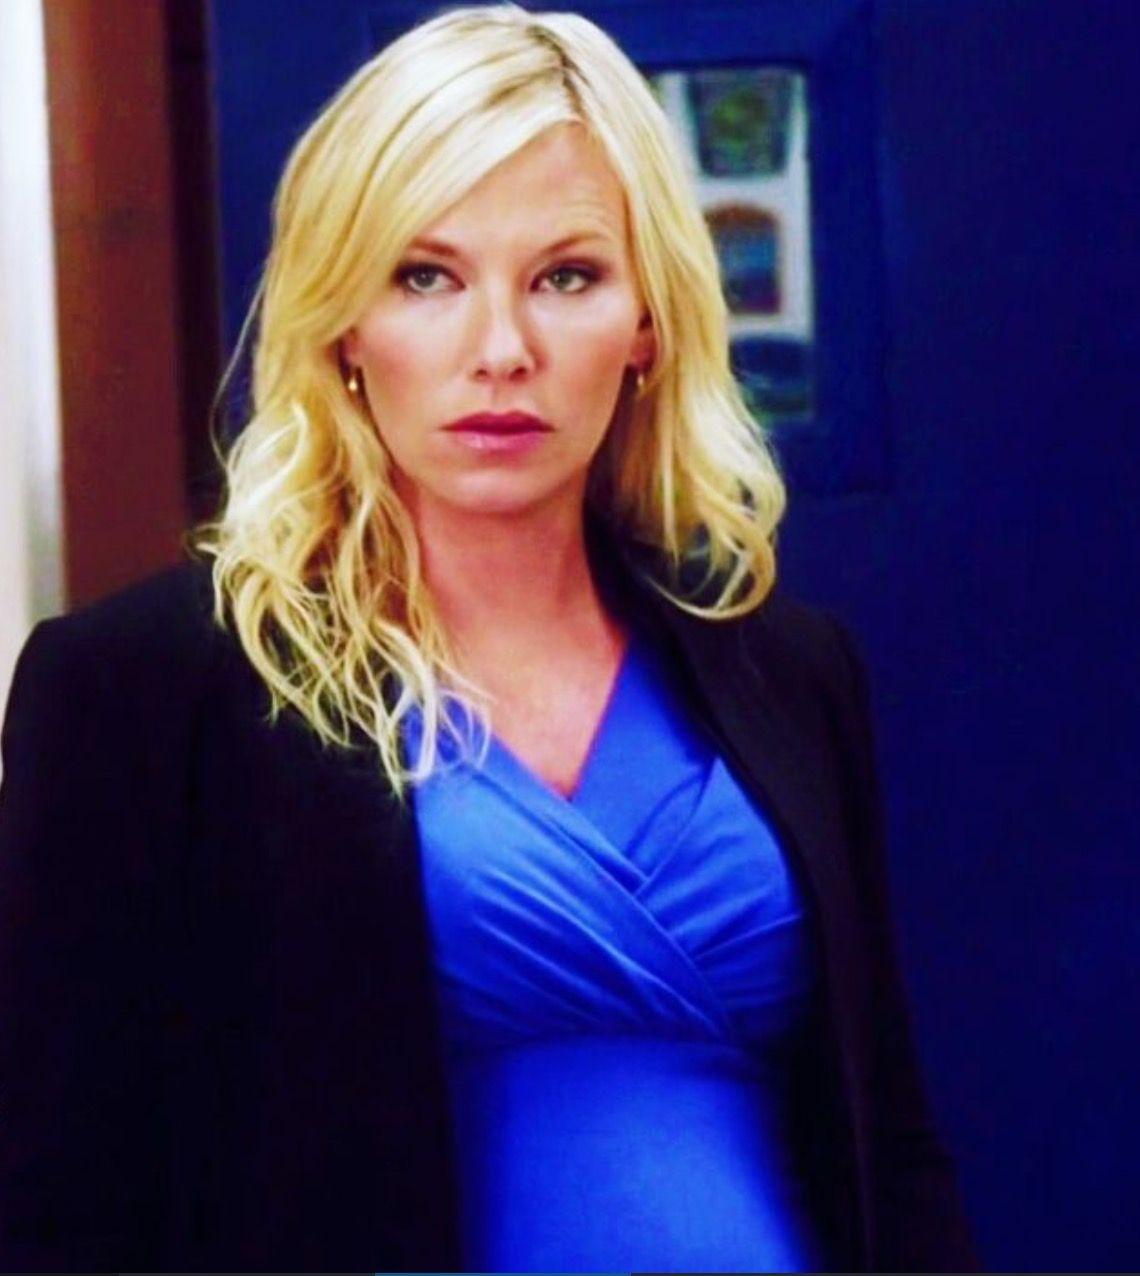 Pregnant Amanda Rollins | Law and order svu, Amanda